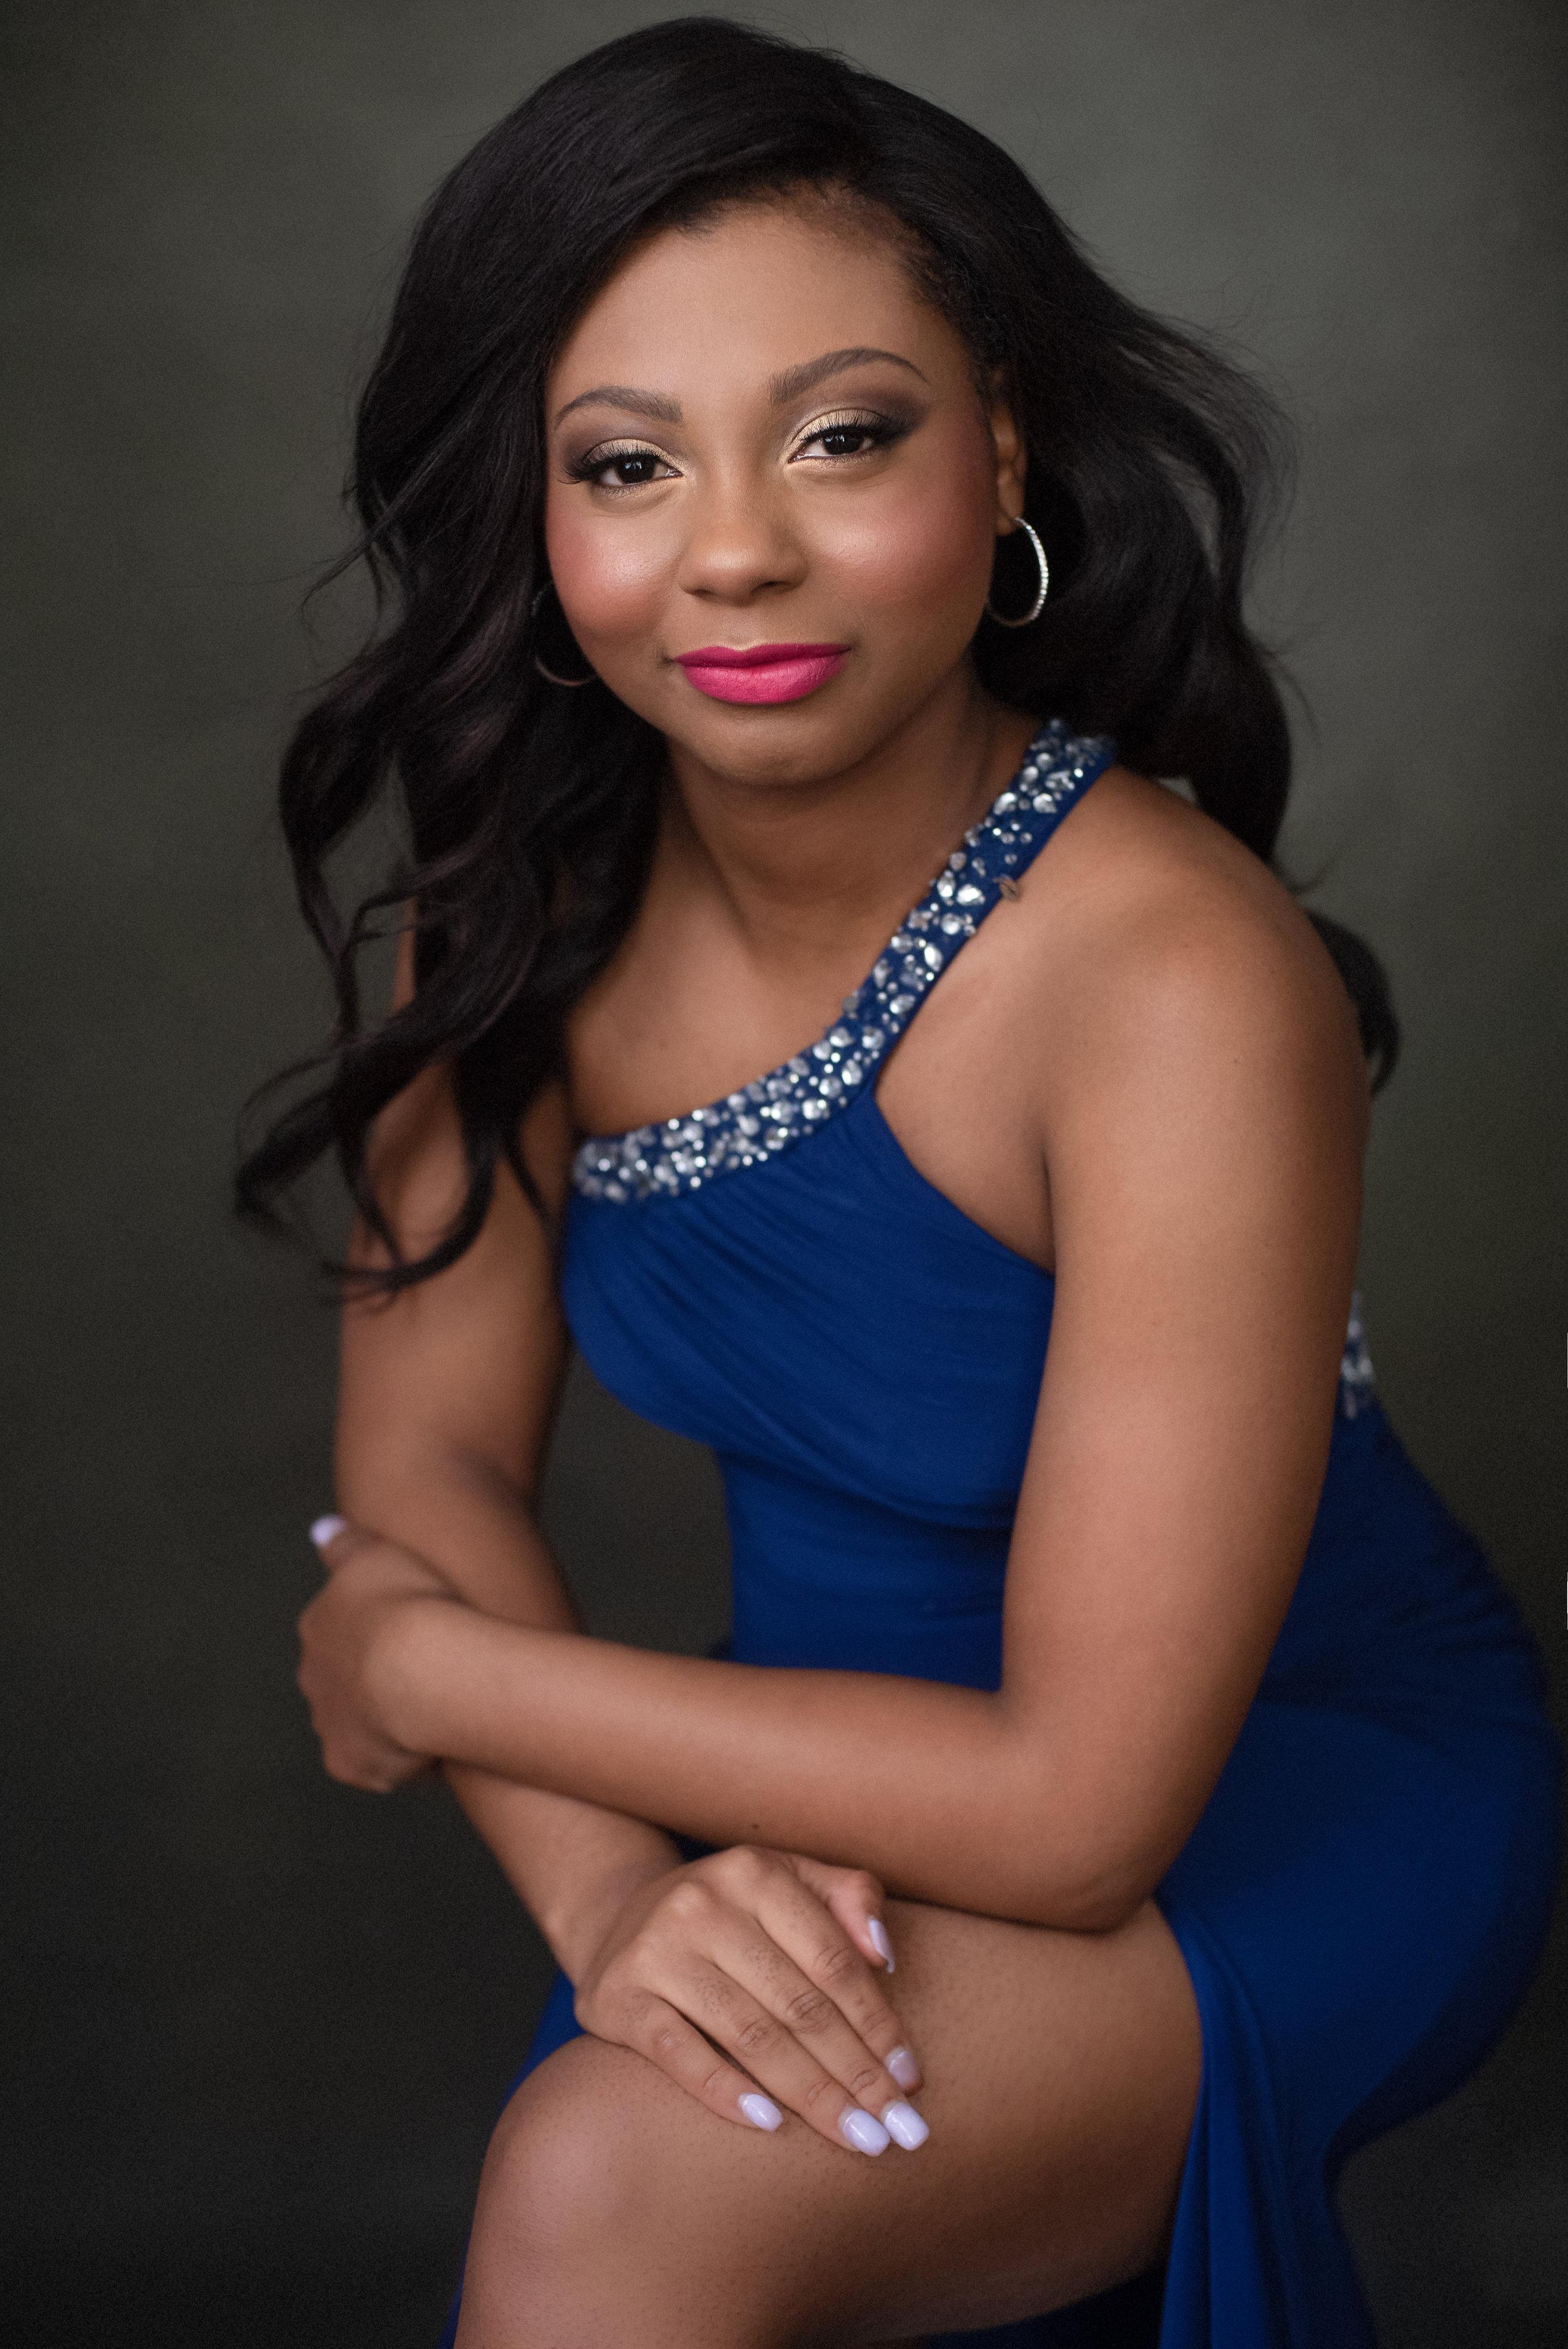 Taisha-NWNY-Michelle Kinney Photography.jpg